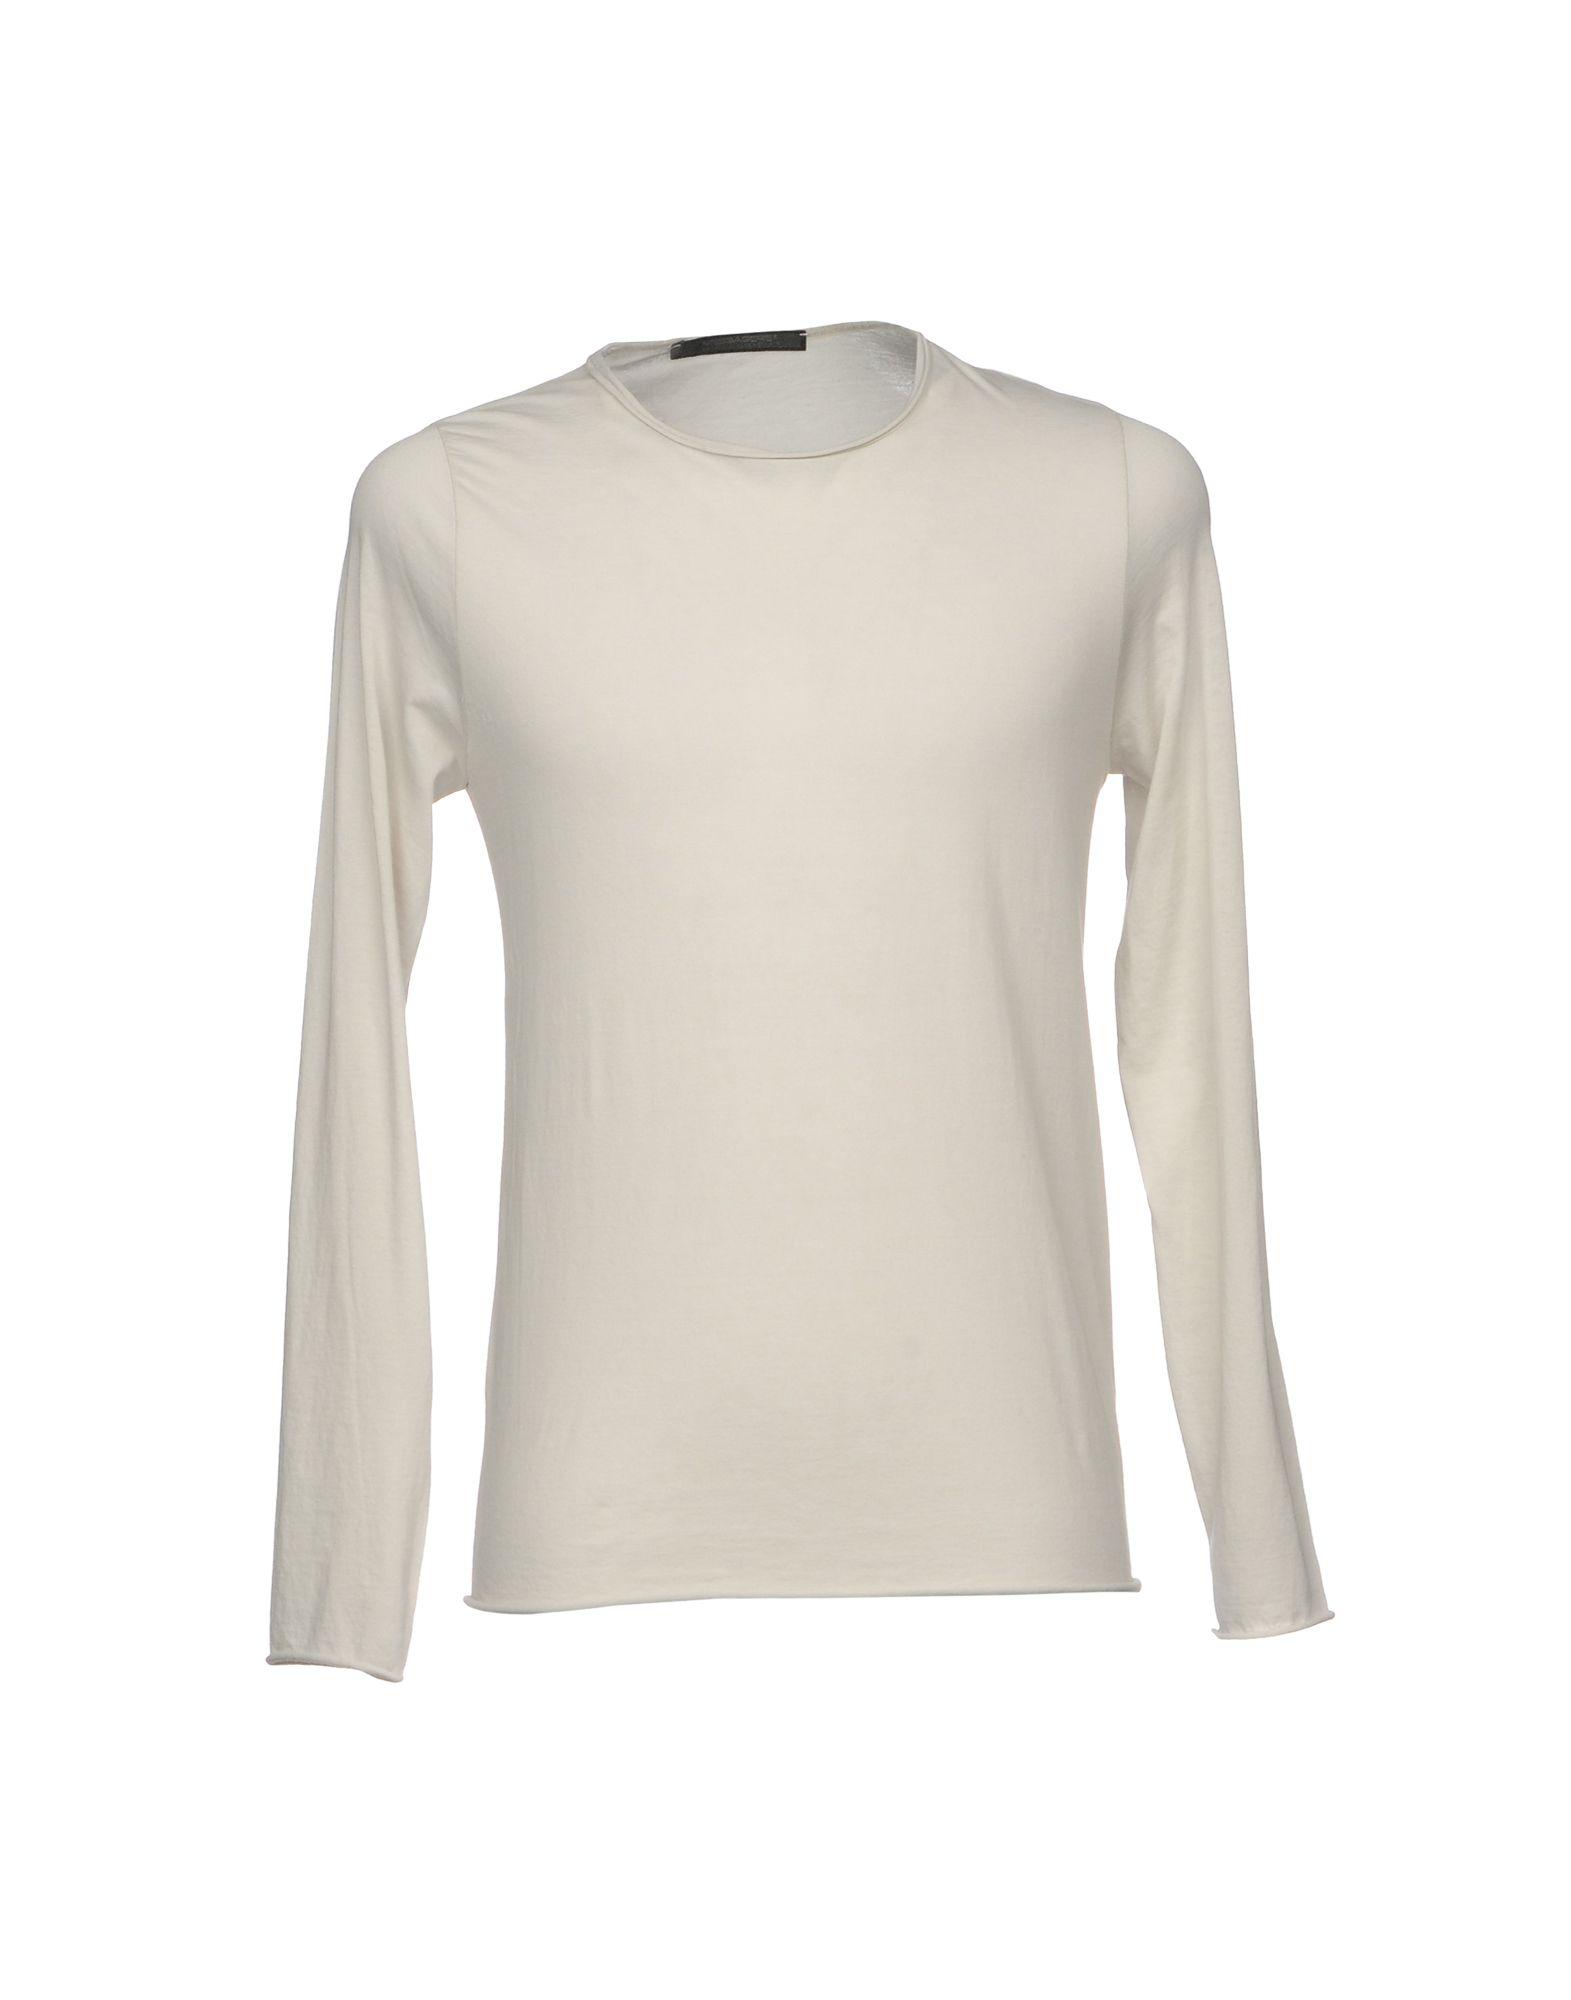 A buon mercato A buon mercato T-Shirt Messagerie Uomo Uomo Messagerie - 12092465VN 3f3aab